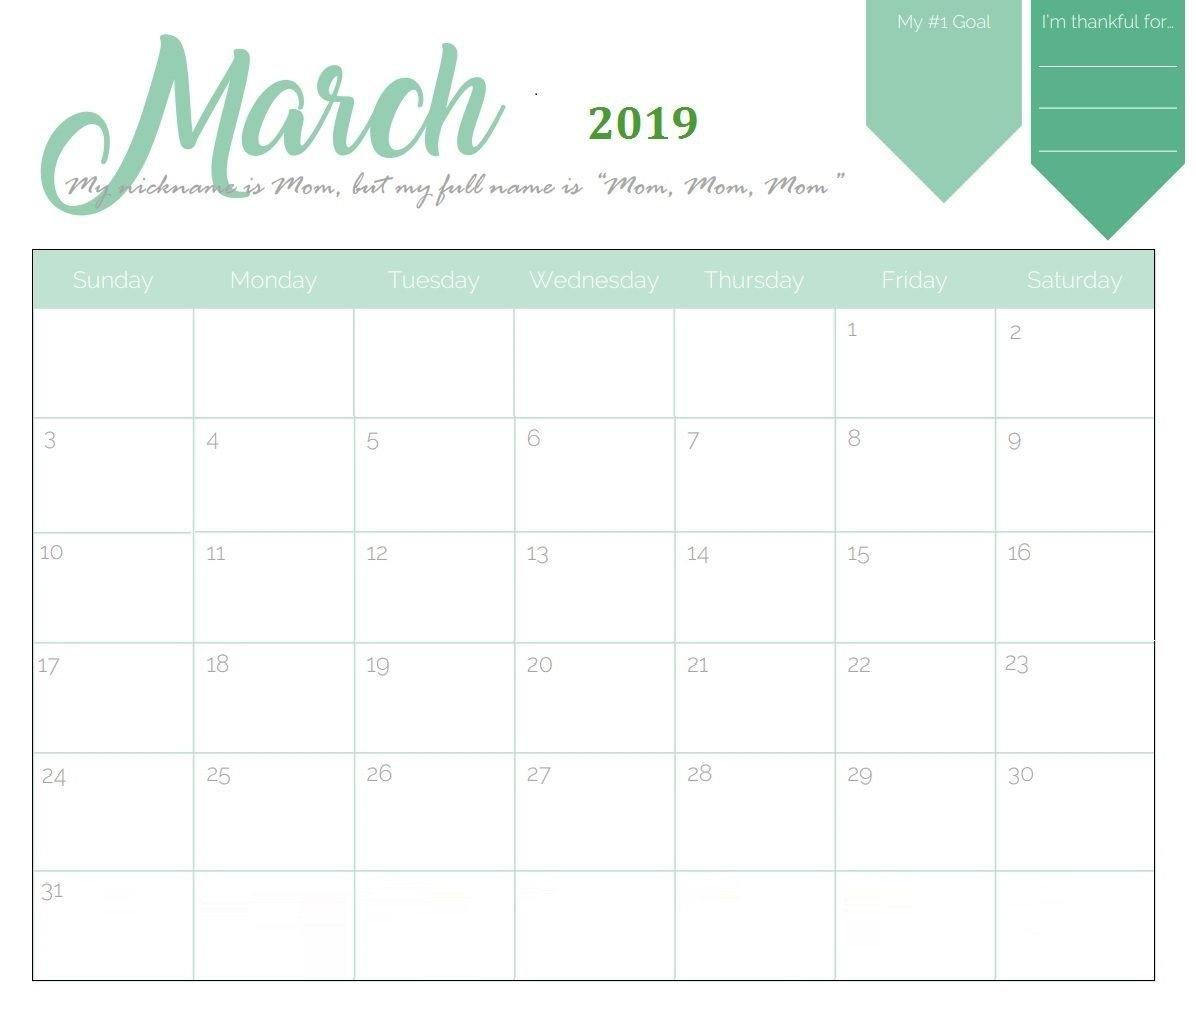 Unique March 2019 Calendar Template | Calendar 2018 | Pinterest Calendar 2019 Template